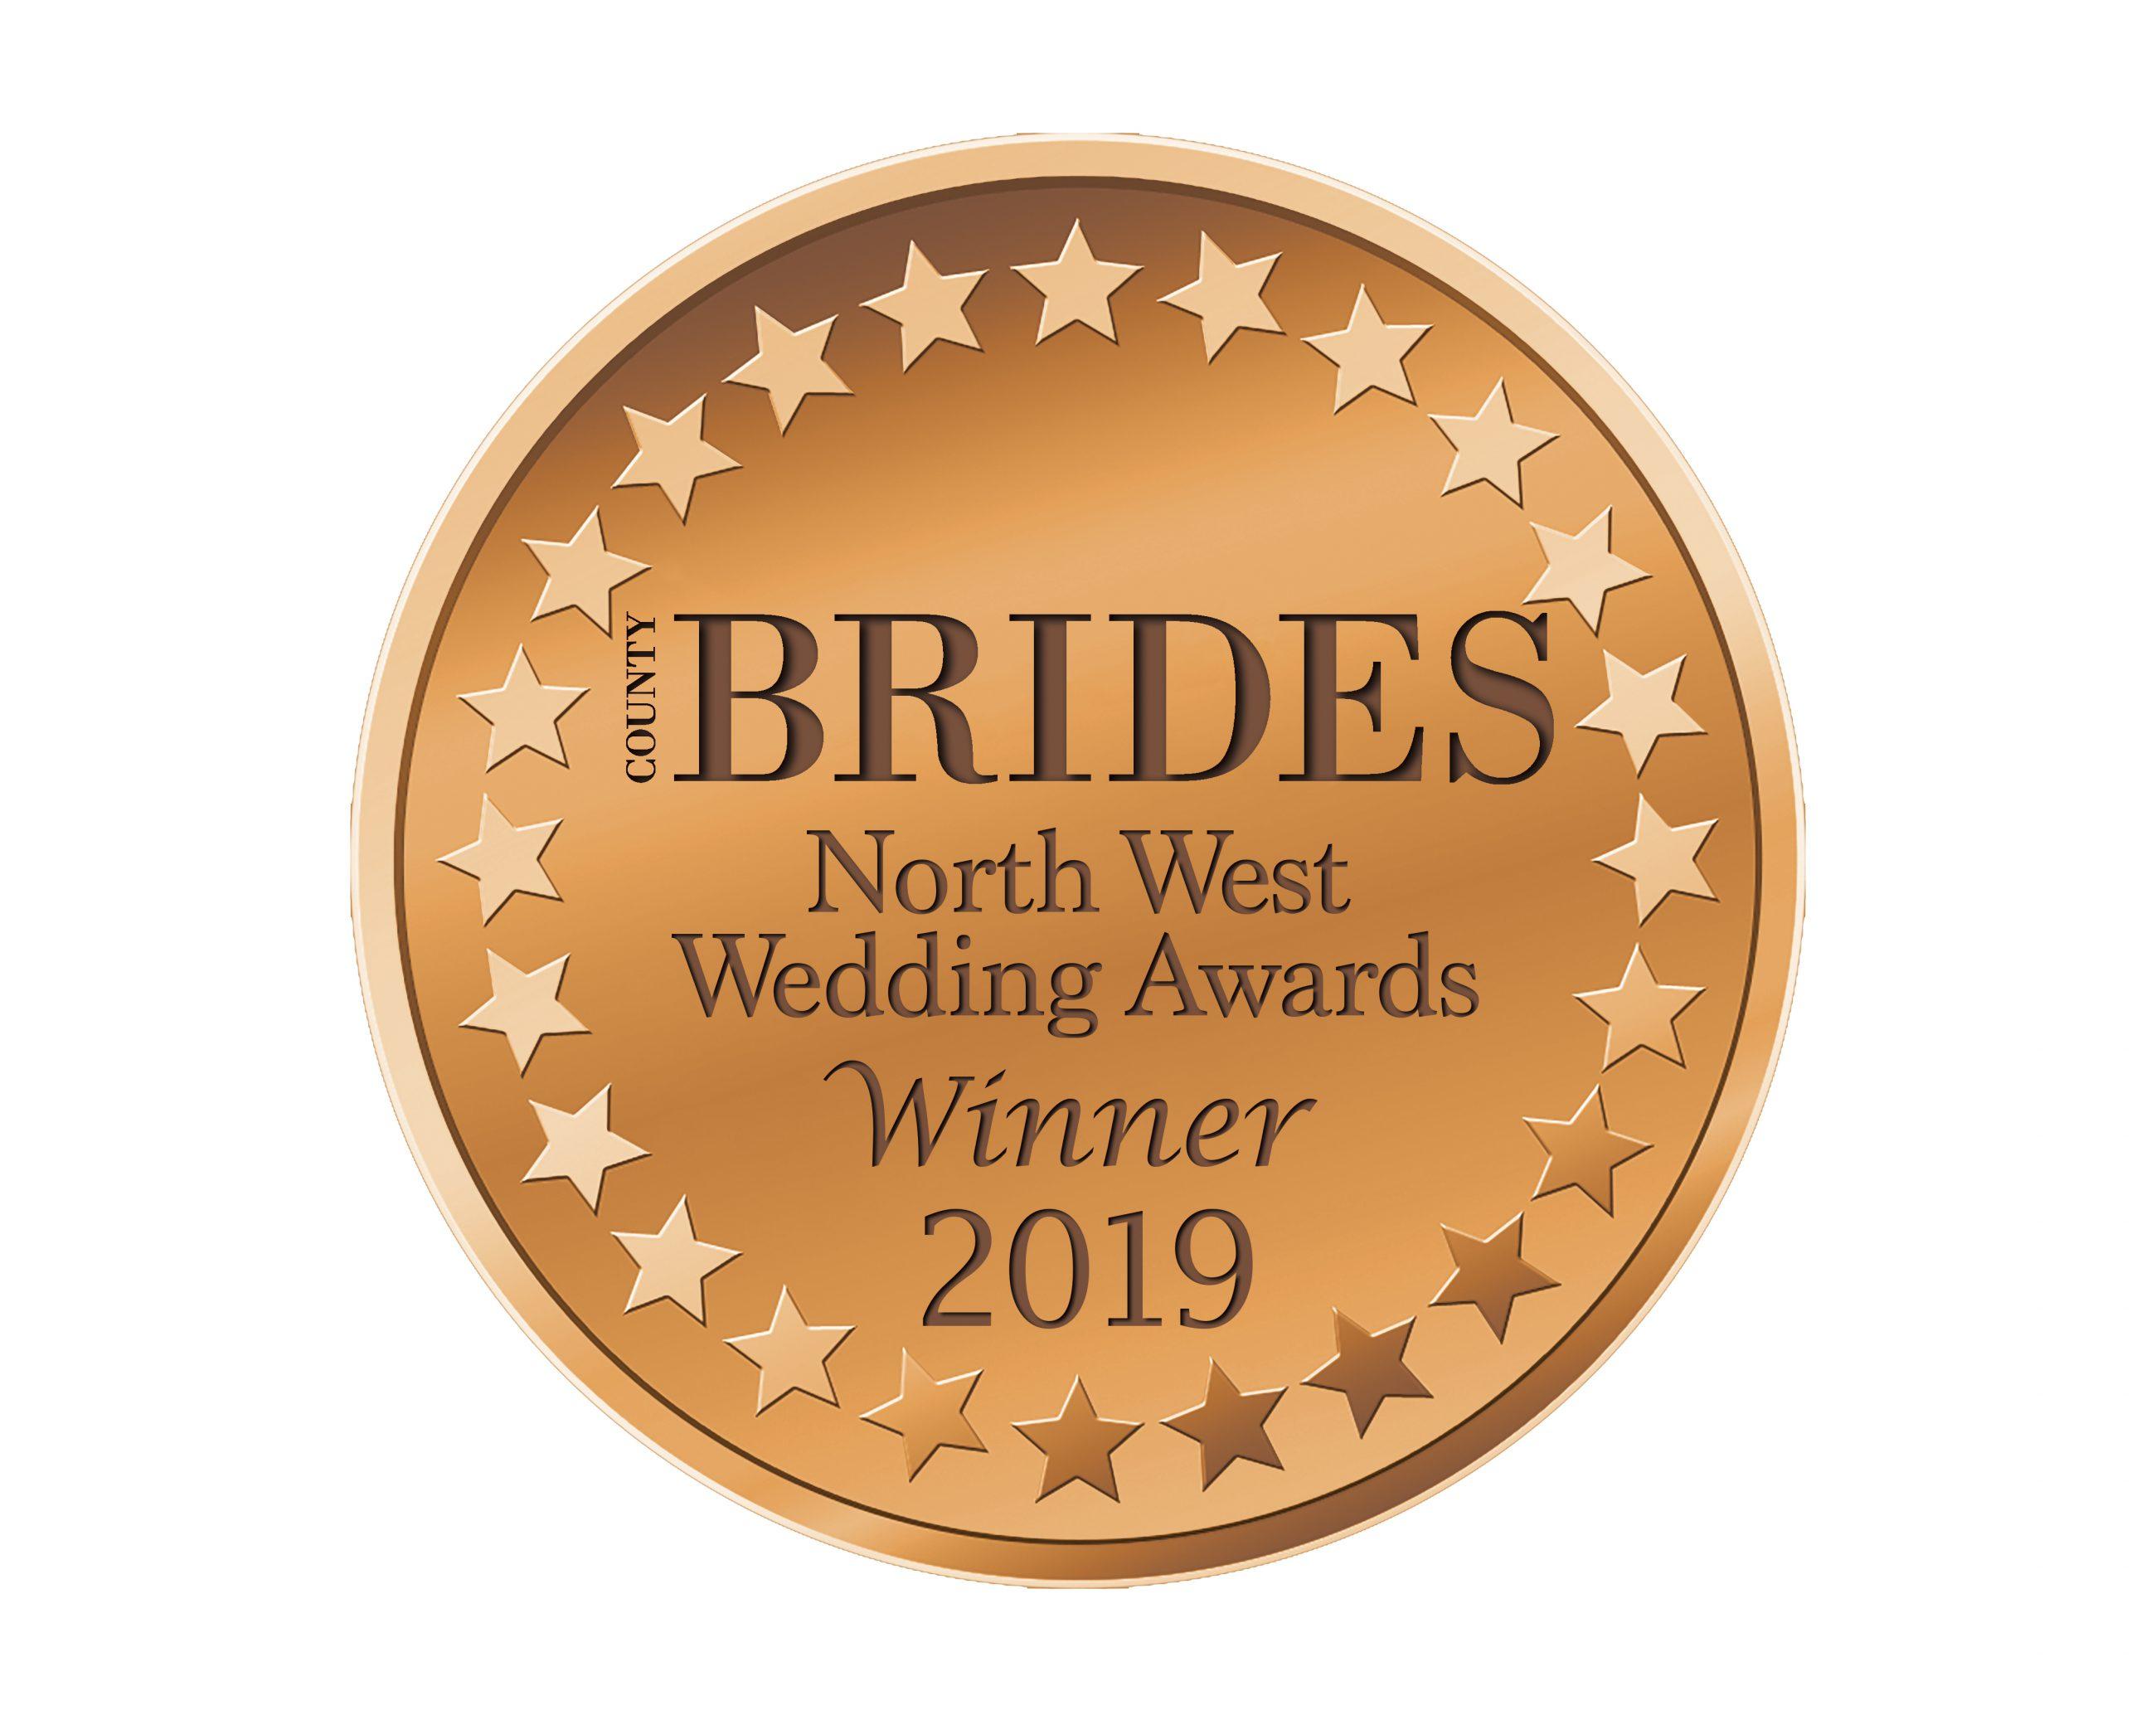 North West Wedding Awards 2019